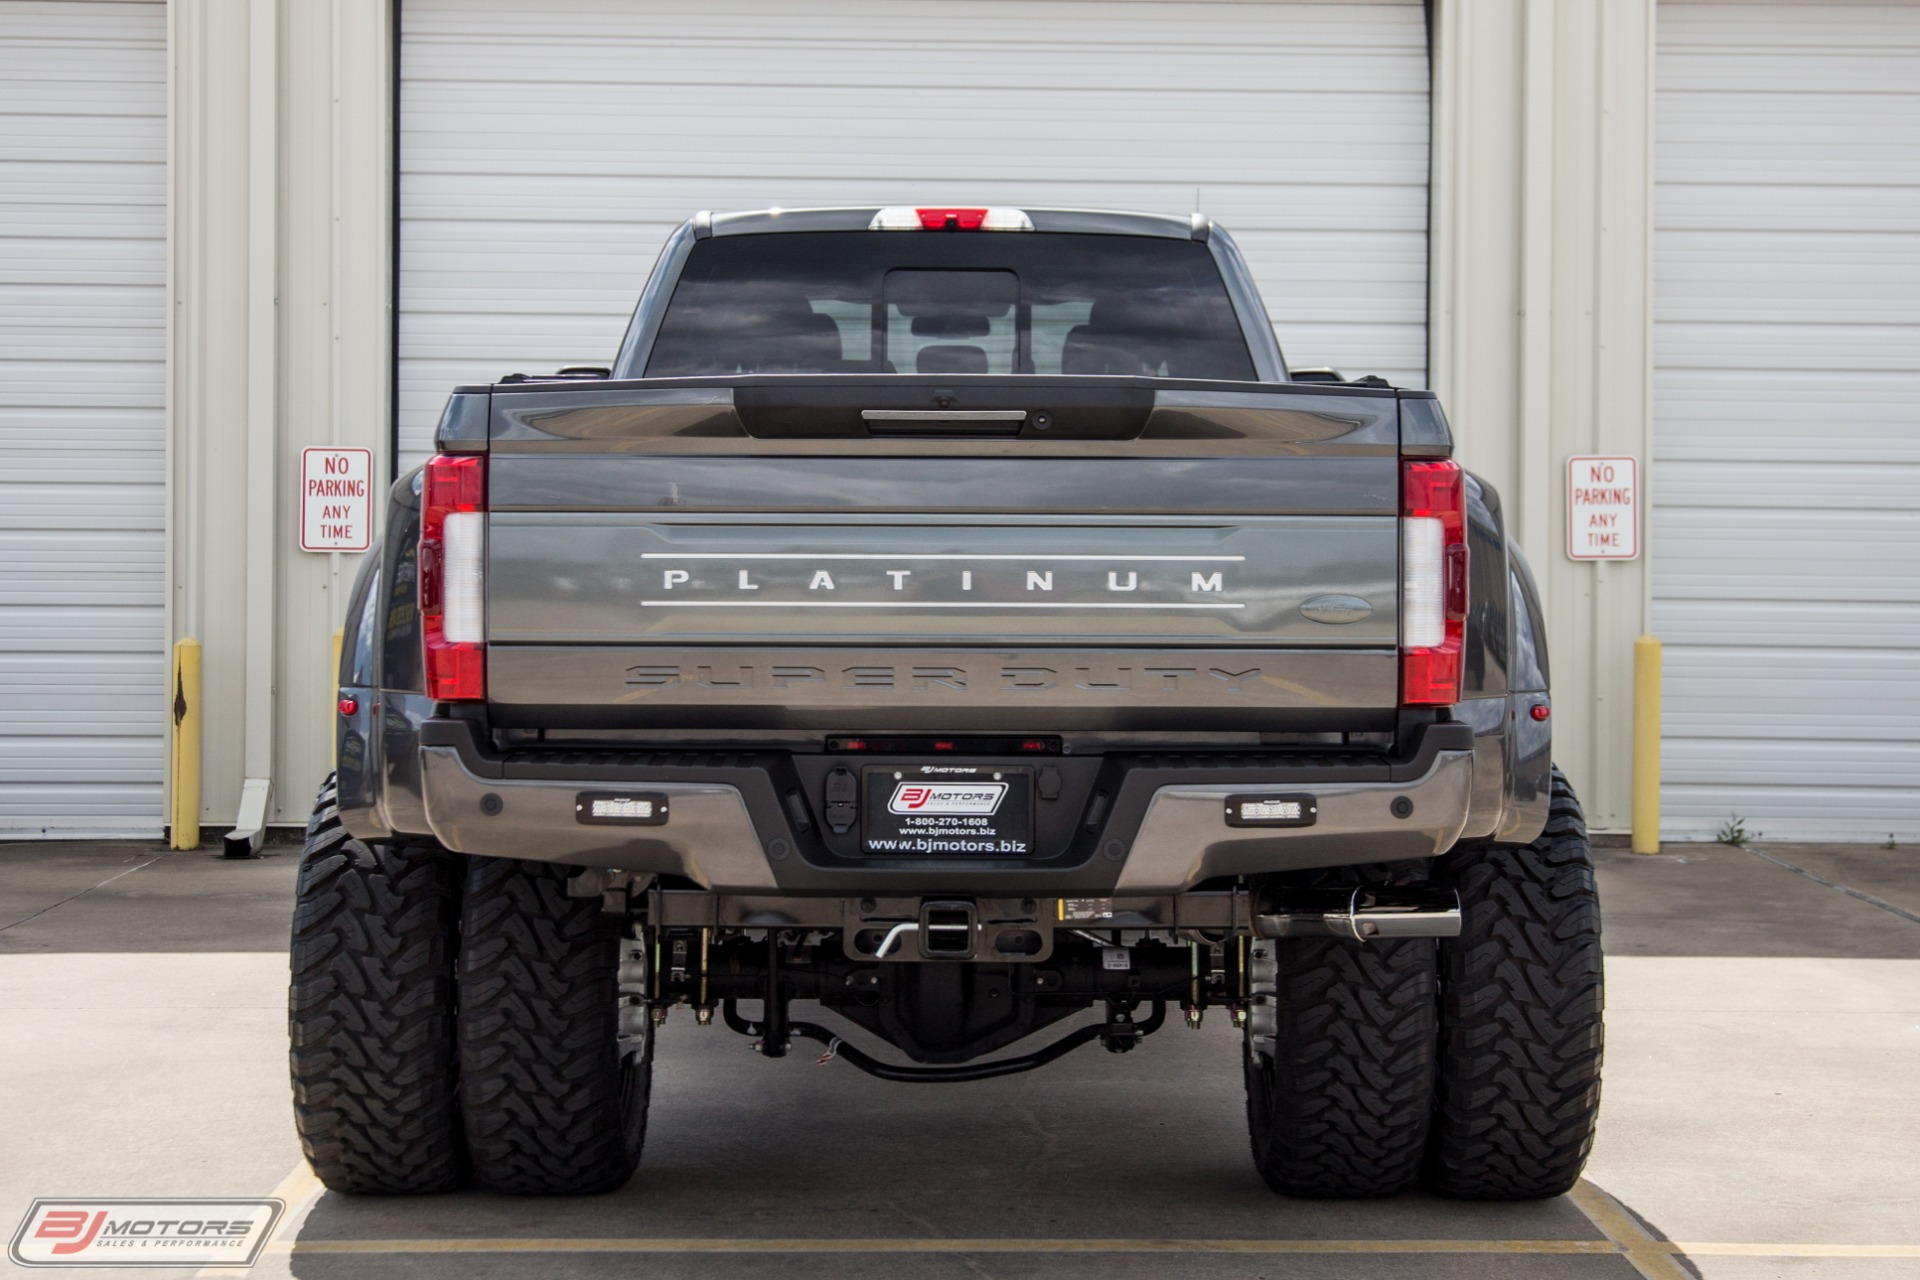 Used-2019-Ford-F-450-Super-Duty-Platinum-Signature-Series-Mega-Build